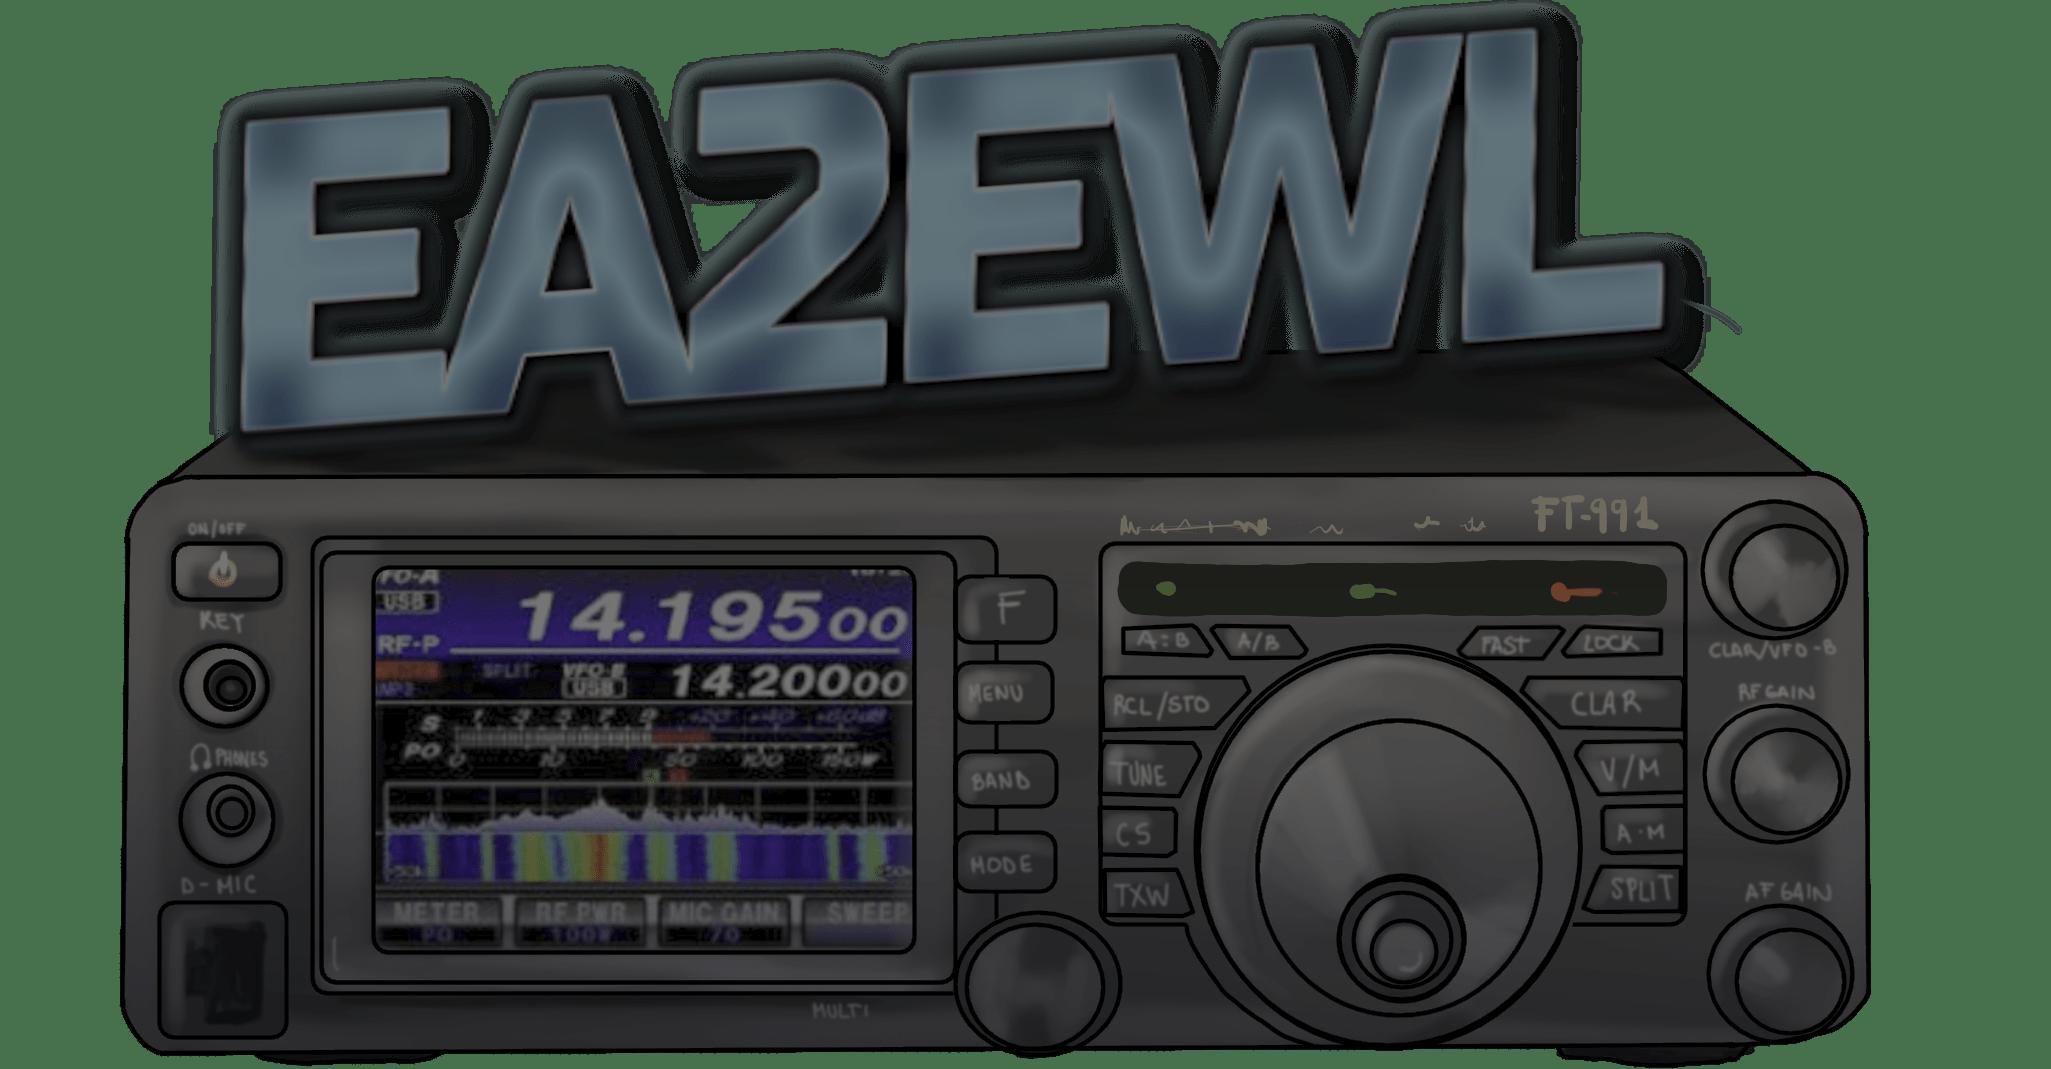 Blog Radioaficionado EA2EWL HF VHF UHF